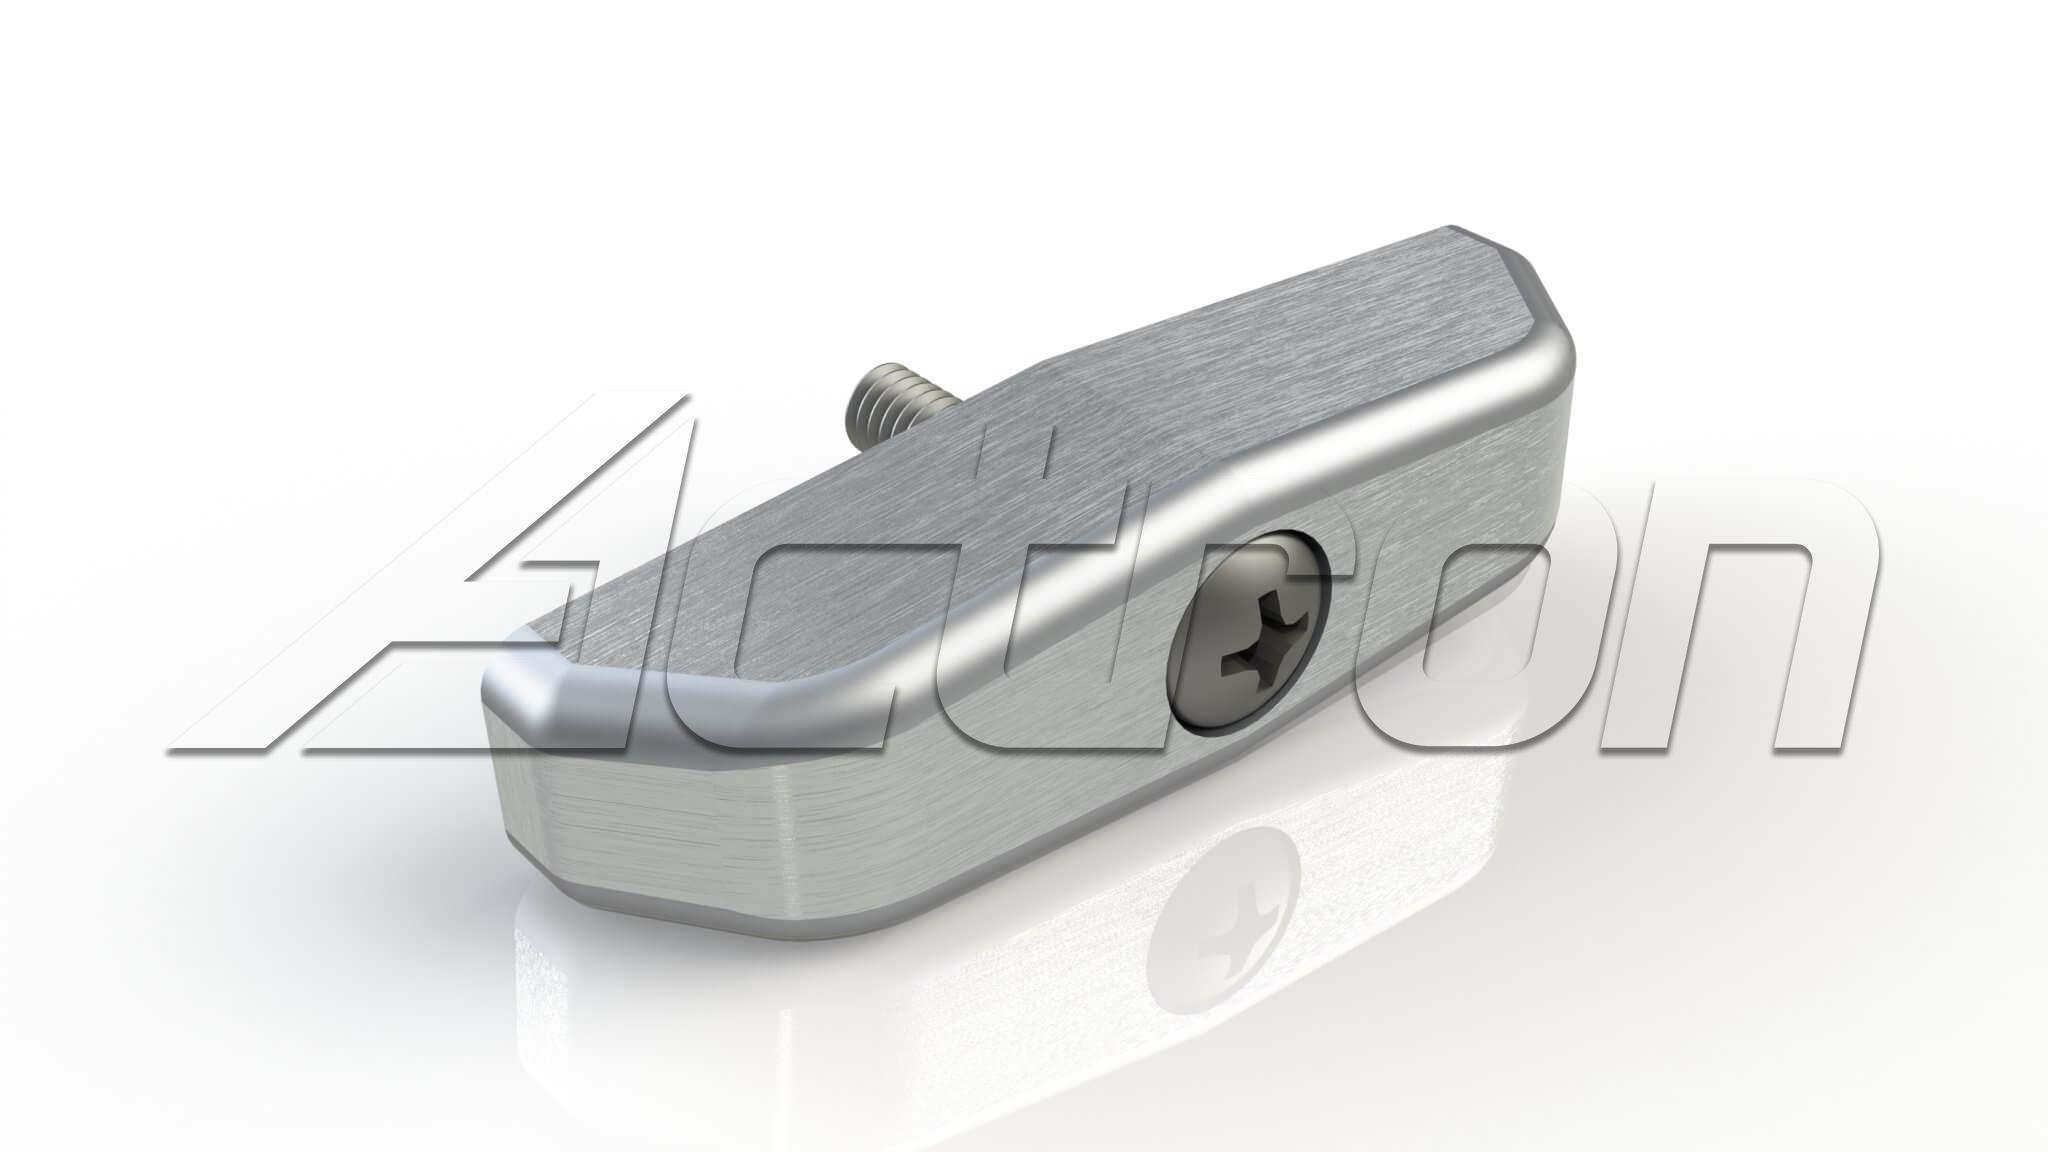 1-4-turn-retainer-4756-a35523.jpg